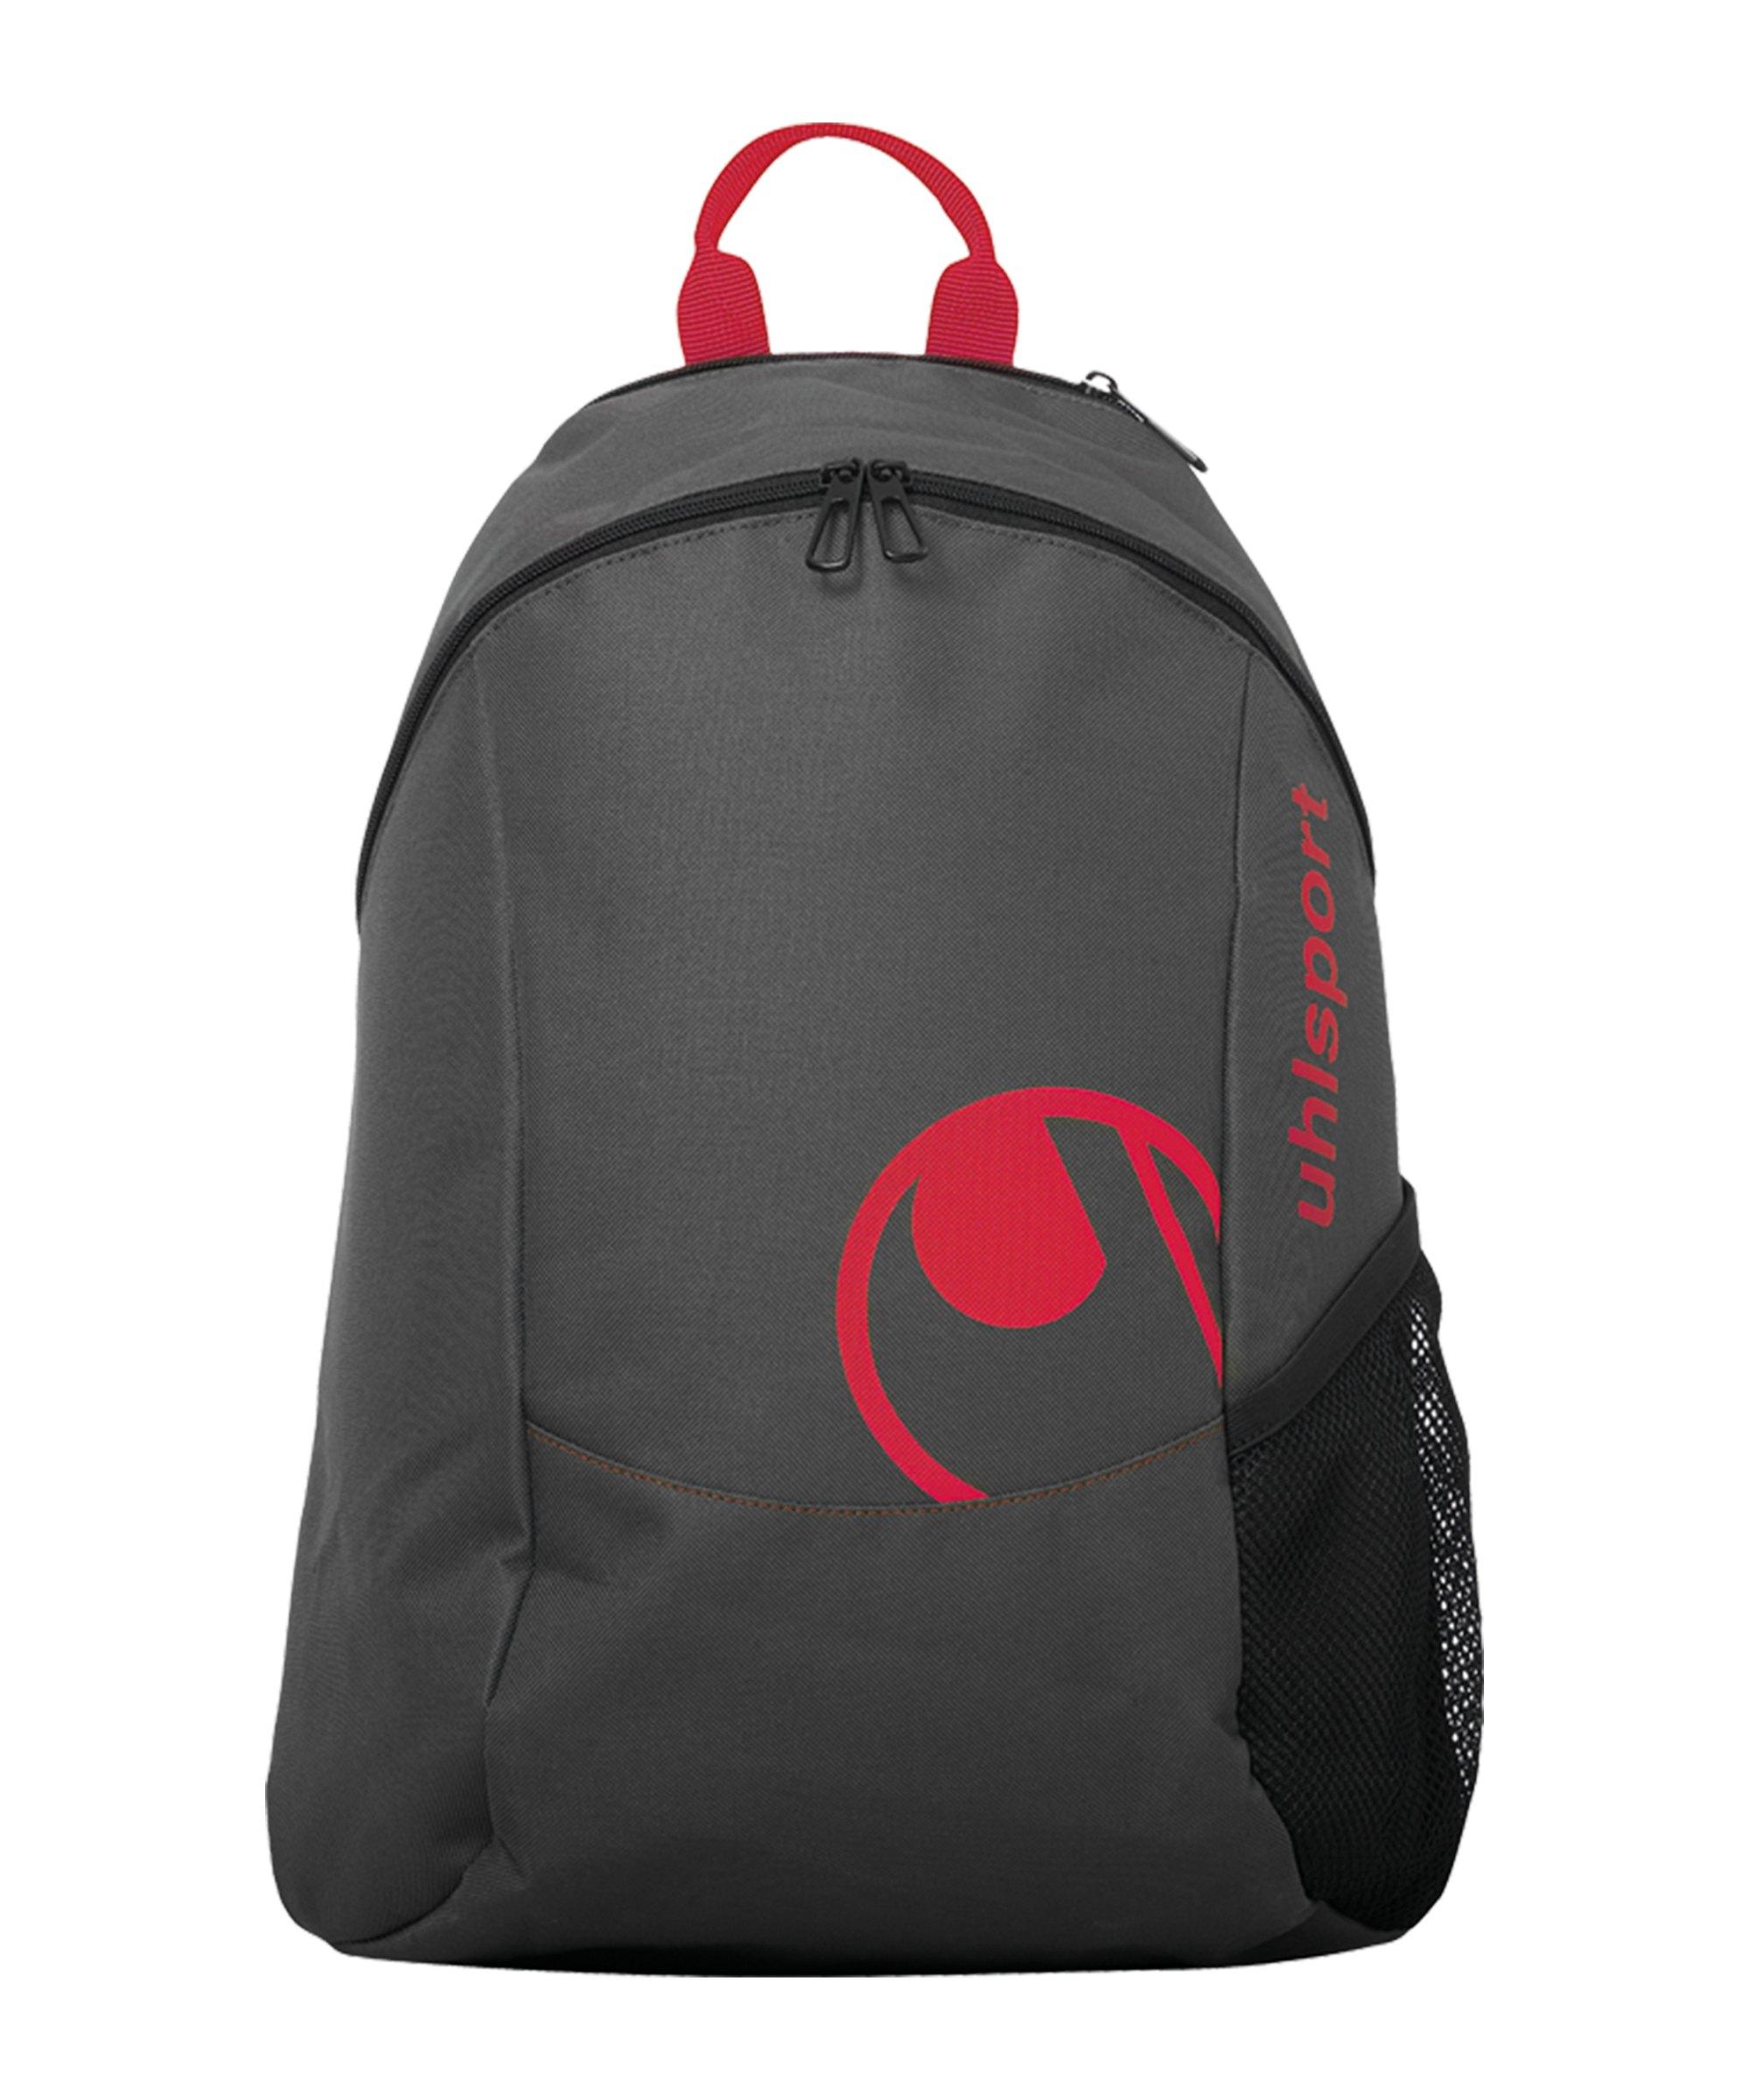 Uhlsport Essential Rucksack Grau Rot F03 - grau